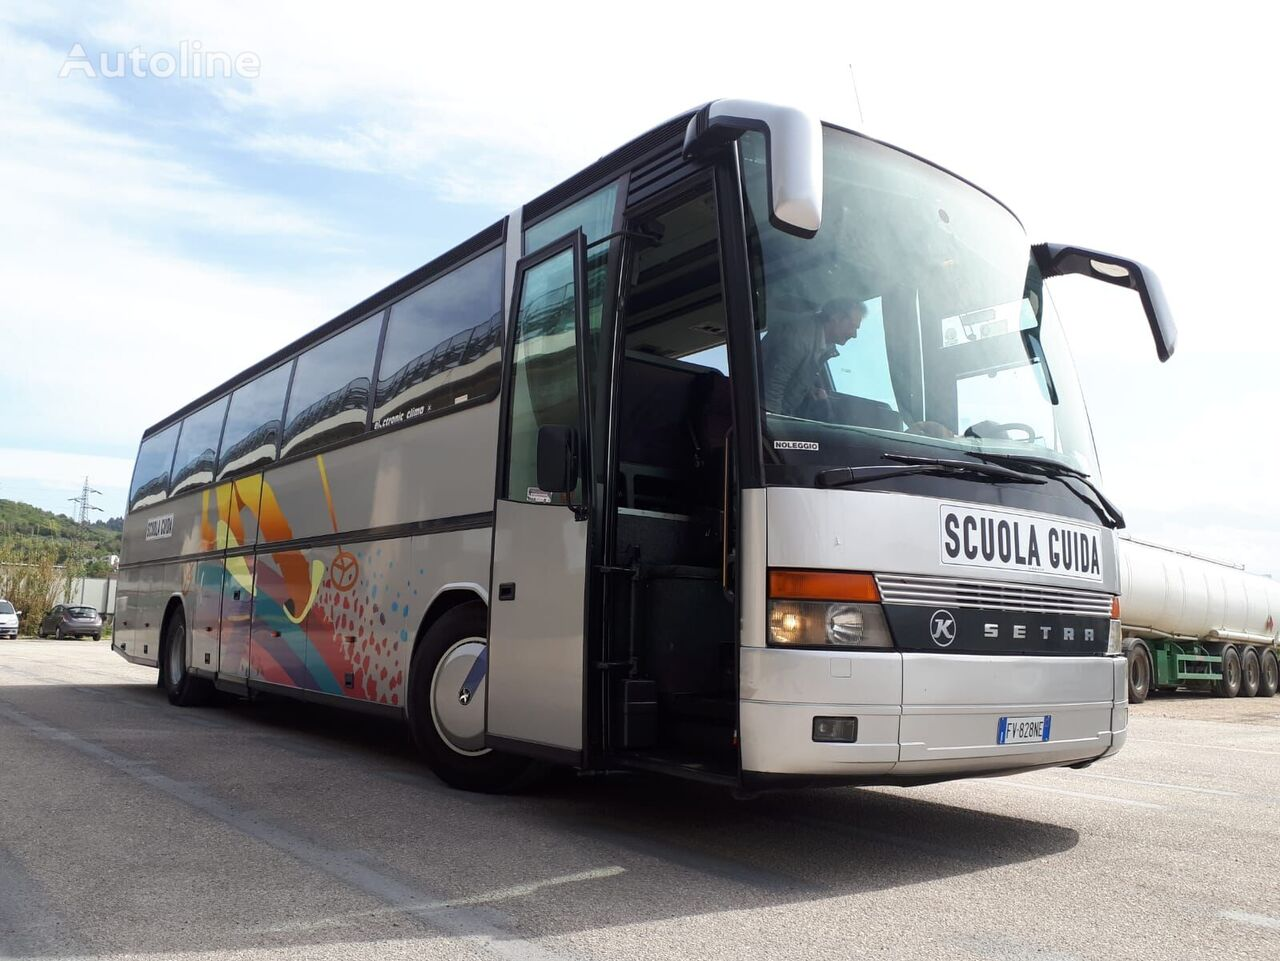 SETRA AUTOBUS SCUOLA GUIDA / AUTOSCUOLA VARI MODELLI autobús de turismo